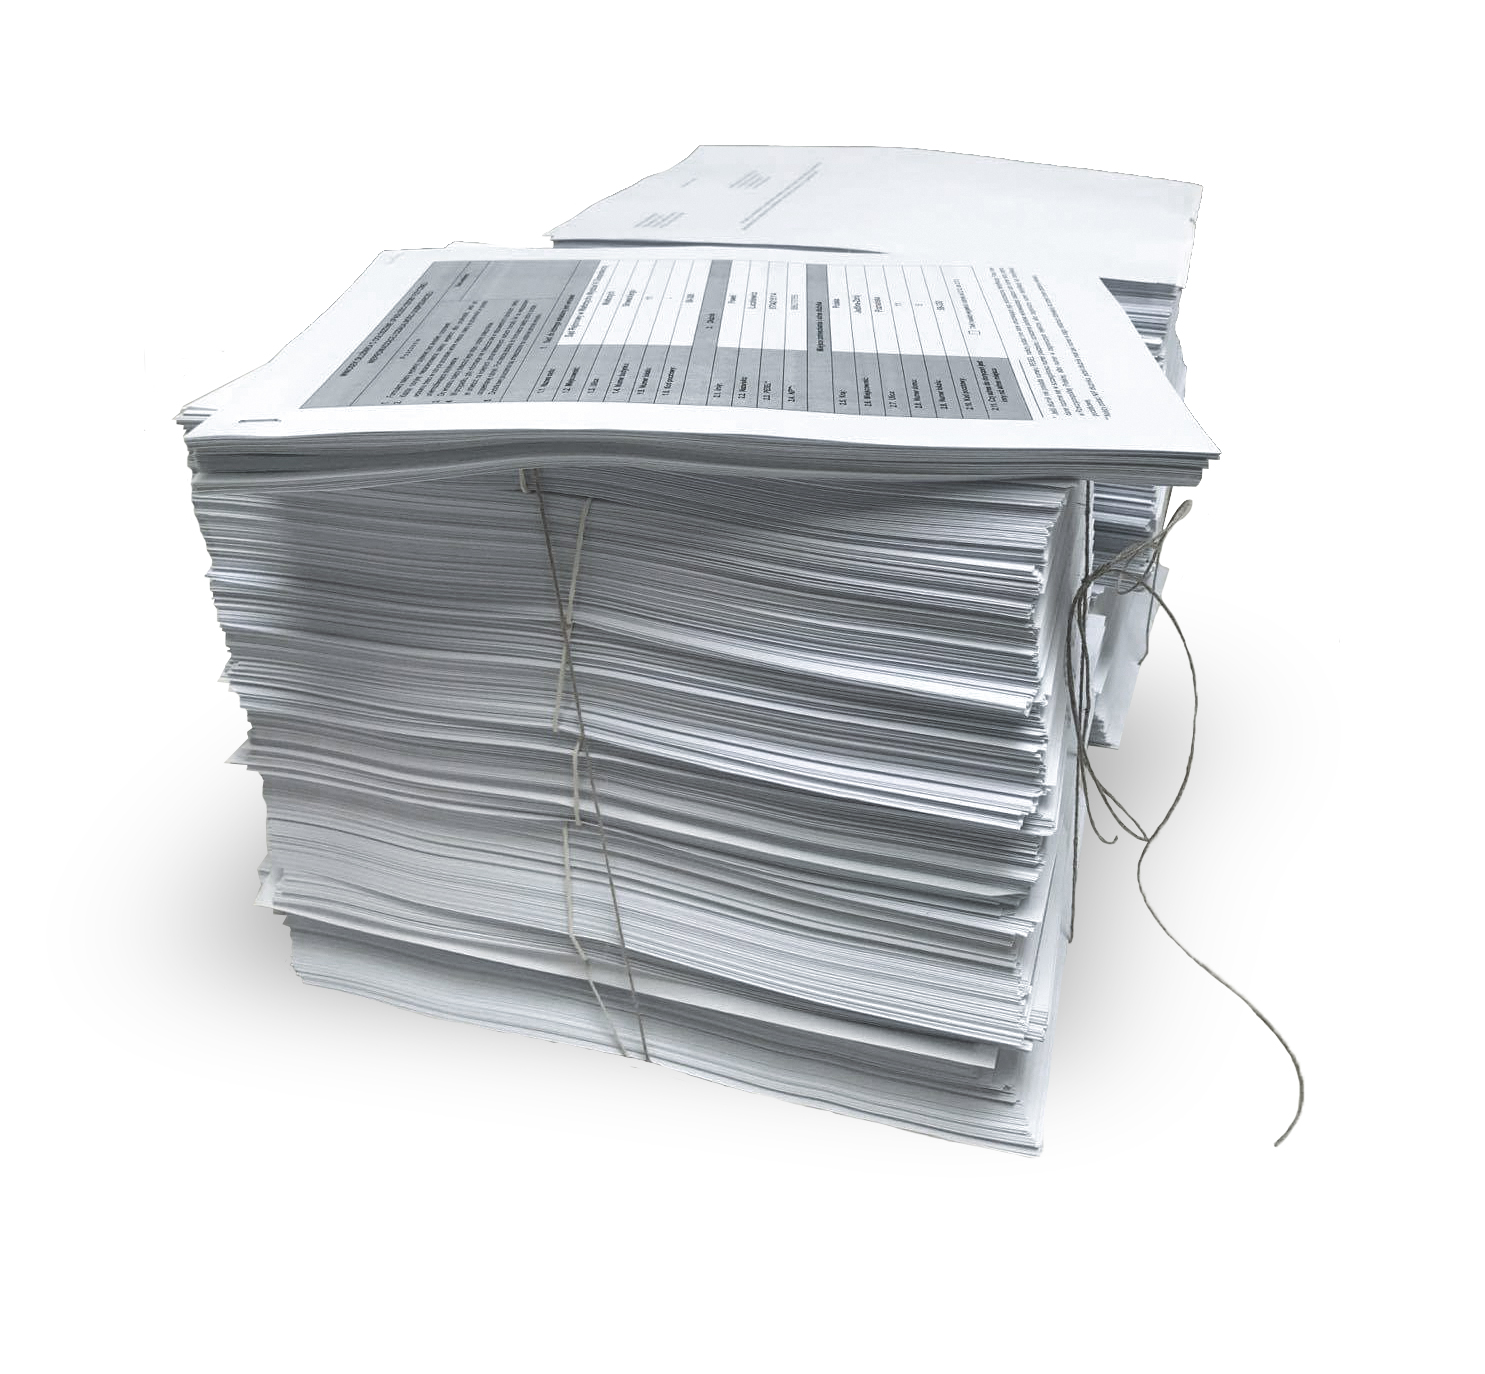 http://serwer1604278.home.pl/konsument.eurekarestrukturyzacje.pl/wp-content/uploads/2020/10/dokumenty-www-kopia.jpg